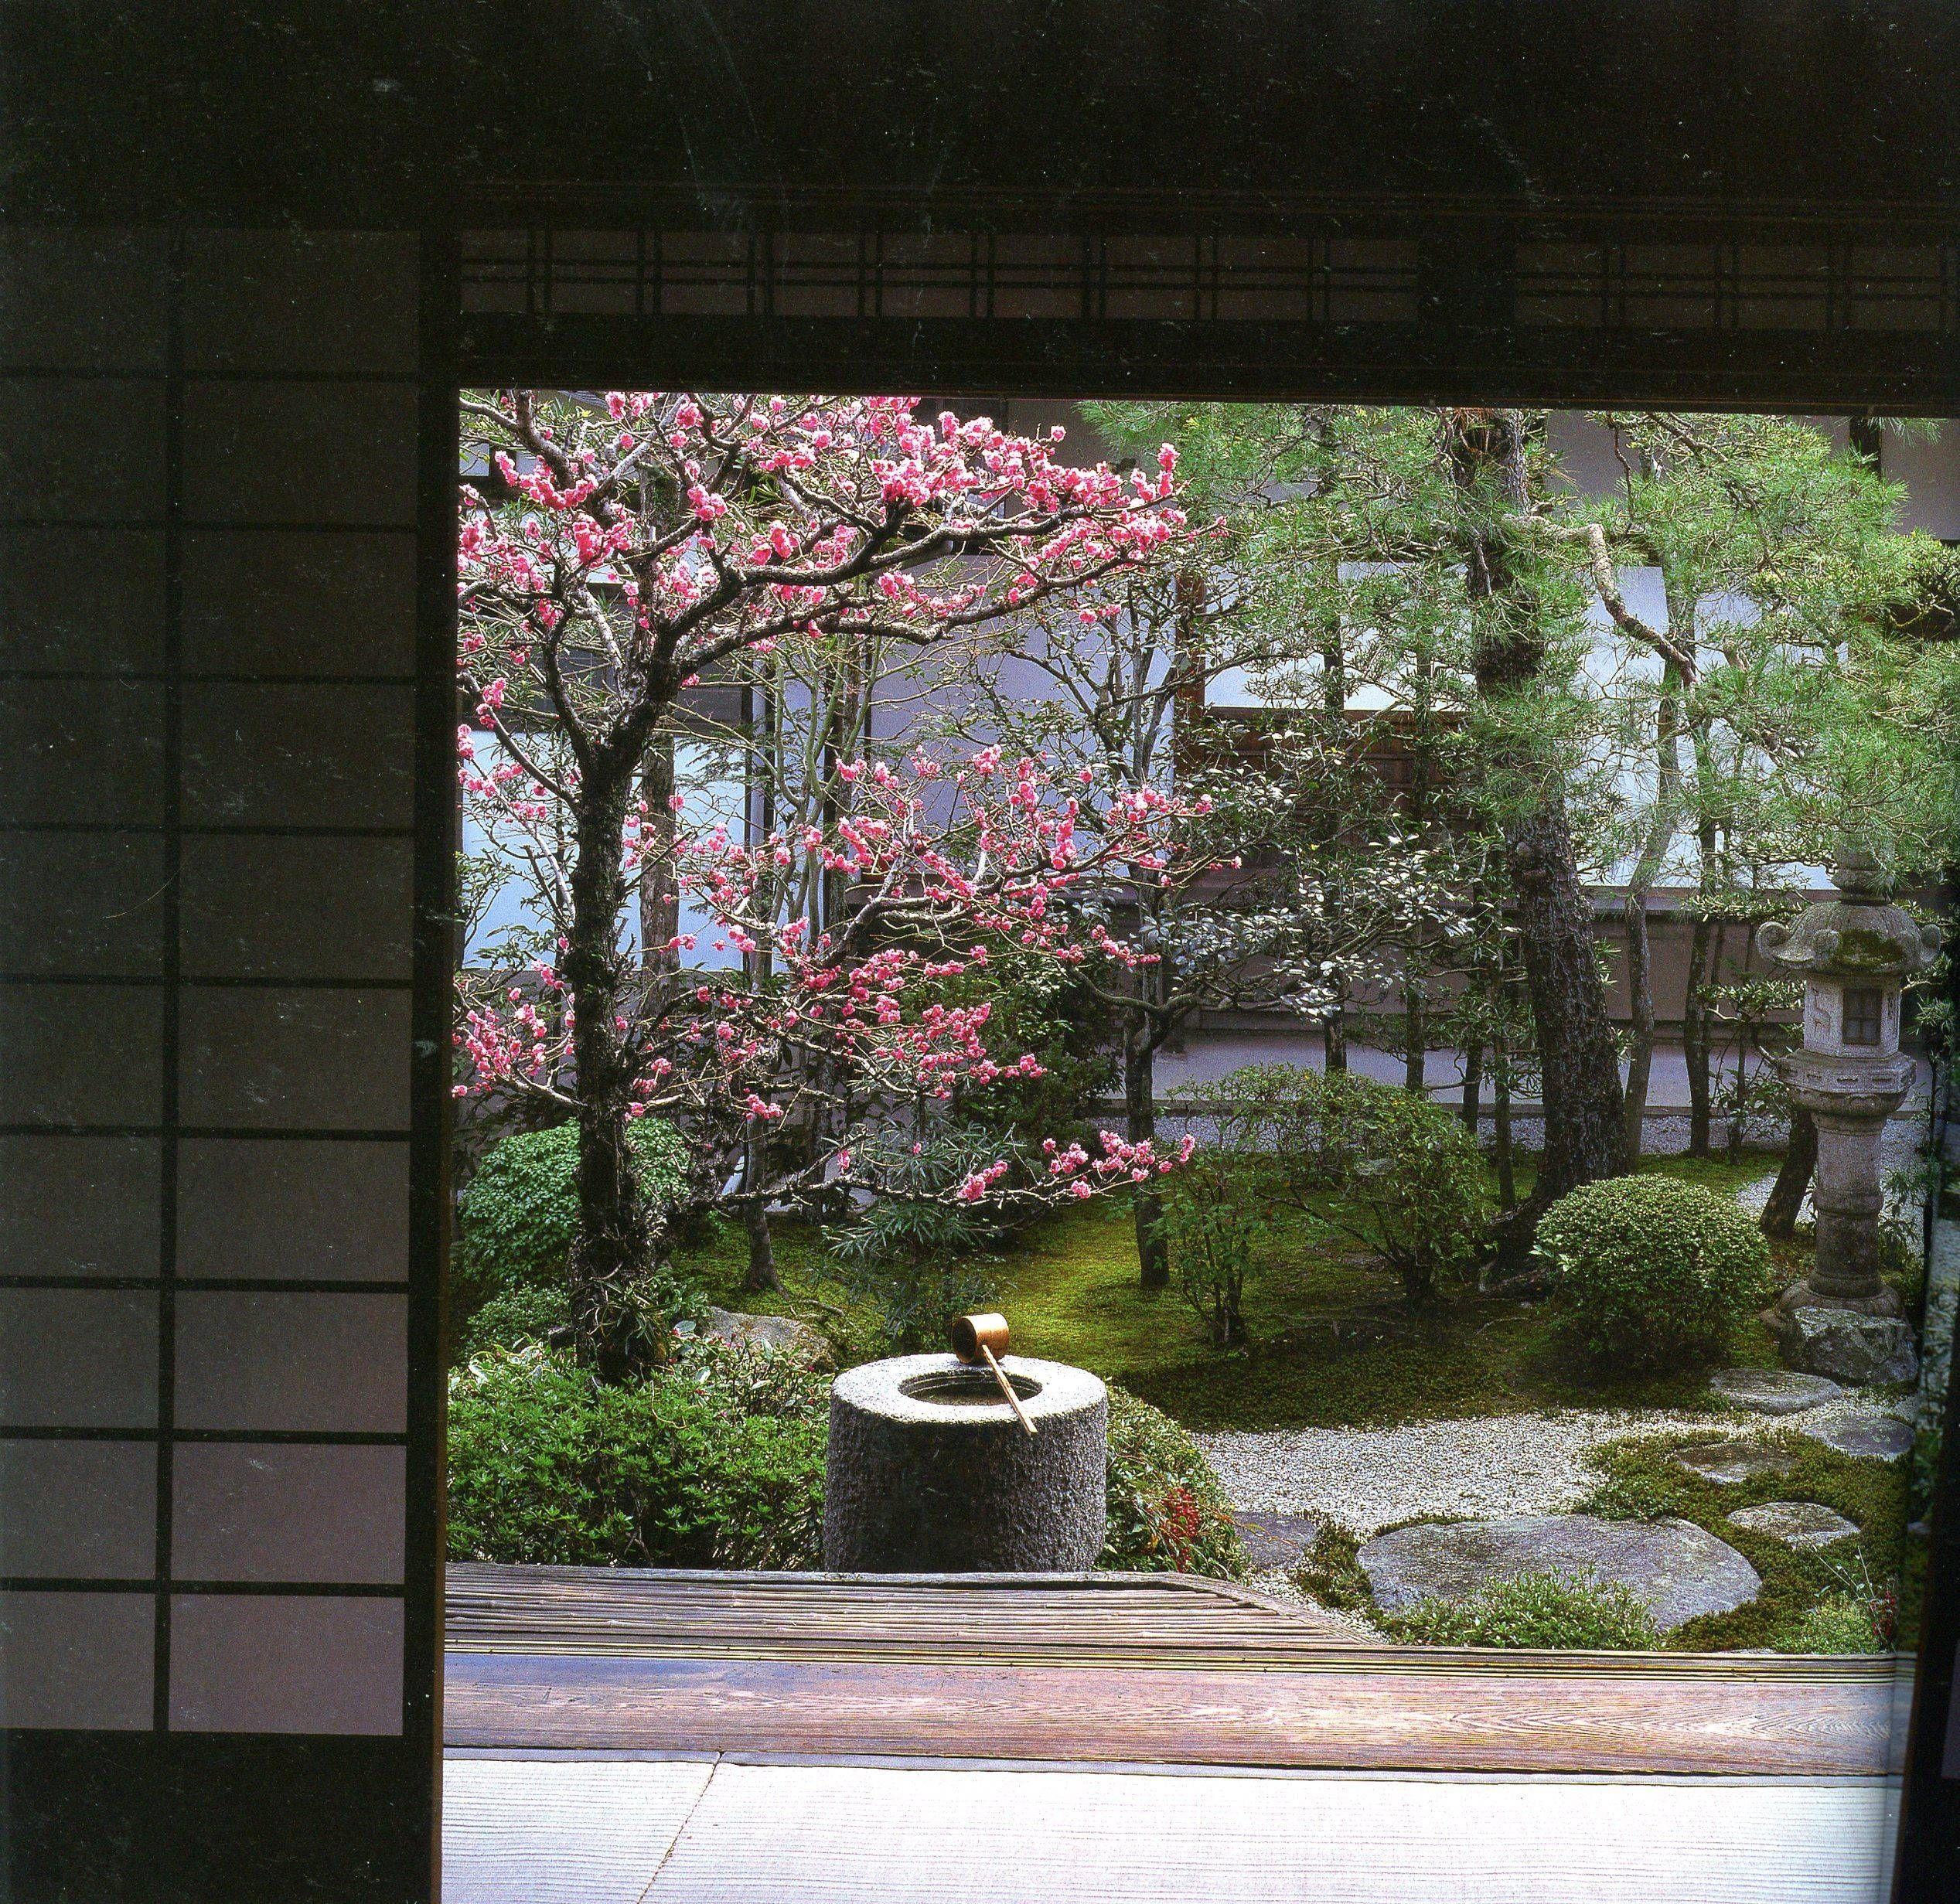 Japanese Inspired Garden , #homedecoration #homedecor #interiordesign #interior #home #homedesign #decor #homesweethome #decoration #design #handmade #interiors #interiordesigner #furniture #homestyle #dekorasirumah #livingroom #art #christmas #interiorstyling #luxury #architecture #homeinspiration #homeinterior